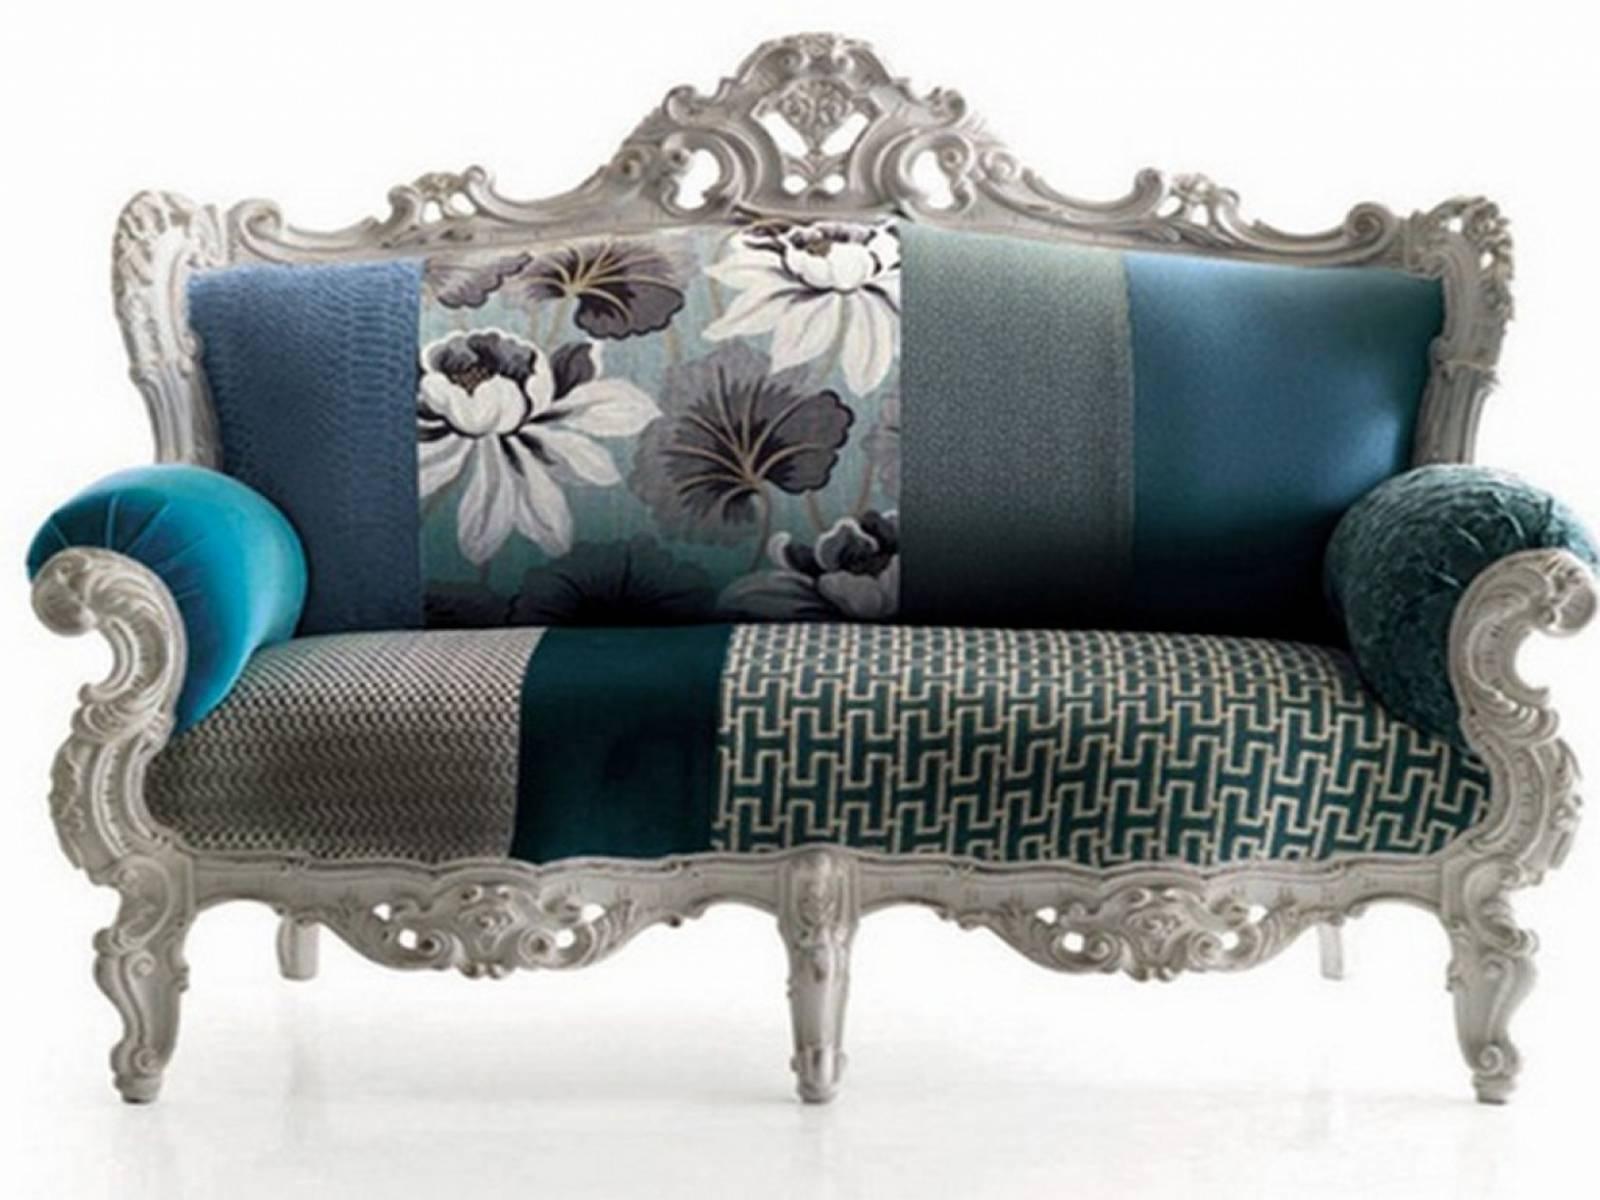 Vintage Modular Leather Patchwork Sofa For Sale At Pamono ~ Idolza regarding Vintage Sofa Styles (Image 26 of 30)